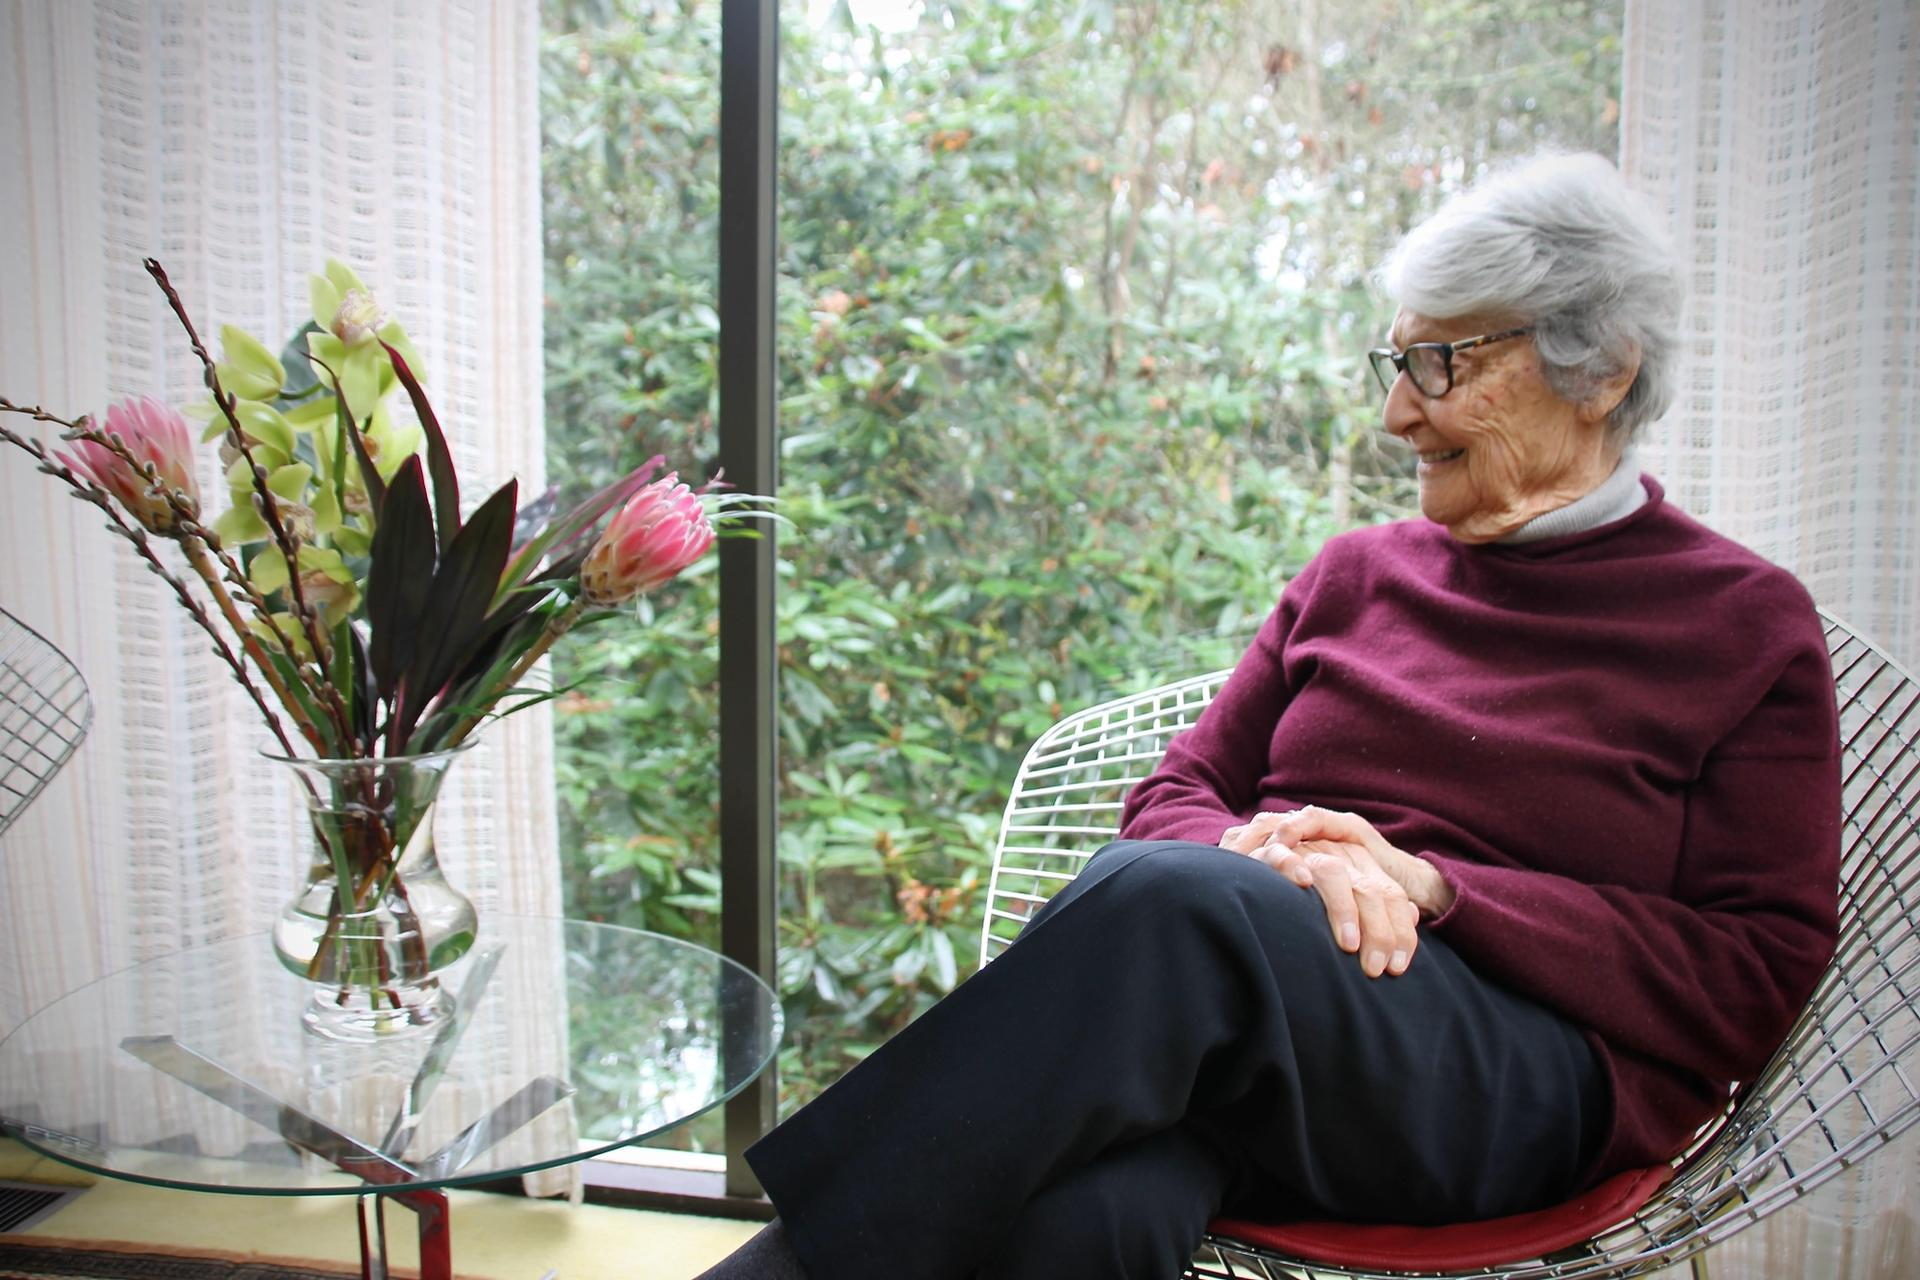 Cornelia Hahn Oberlander at her home in Vancouver in 2018 Photo: Hadani Ditmars